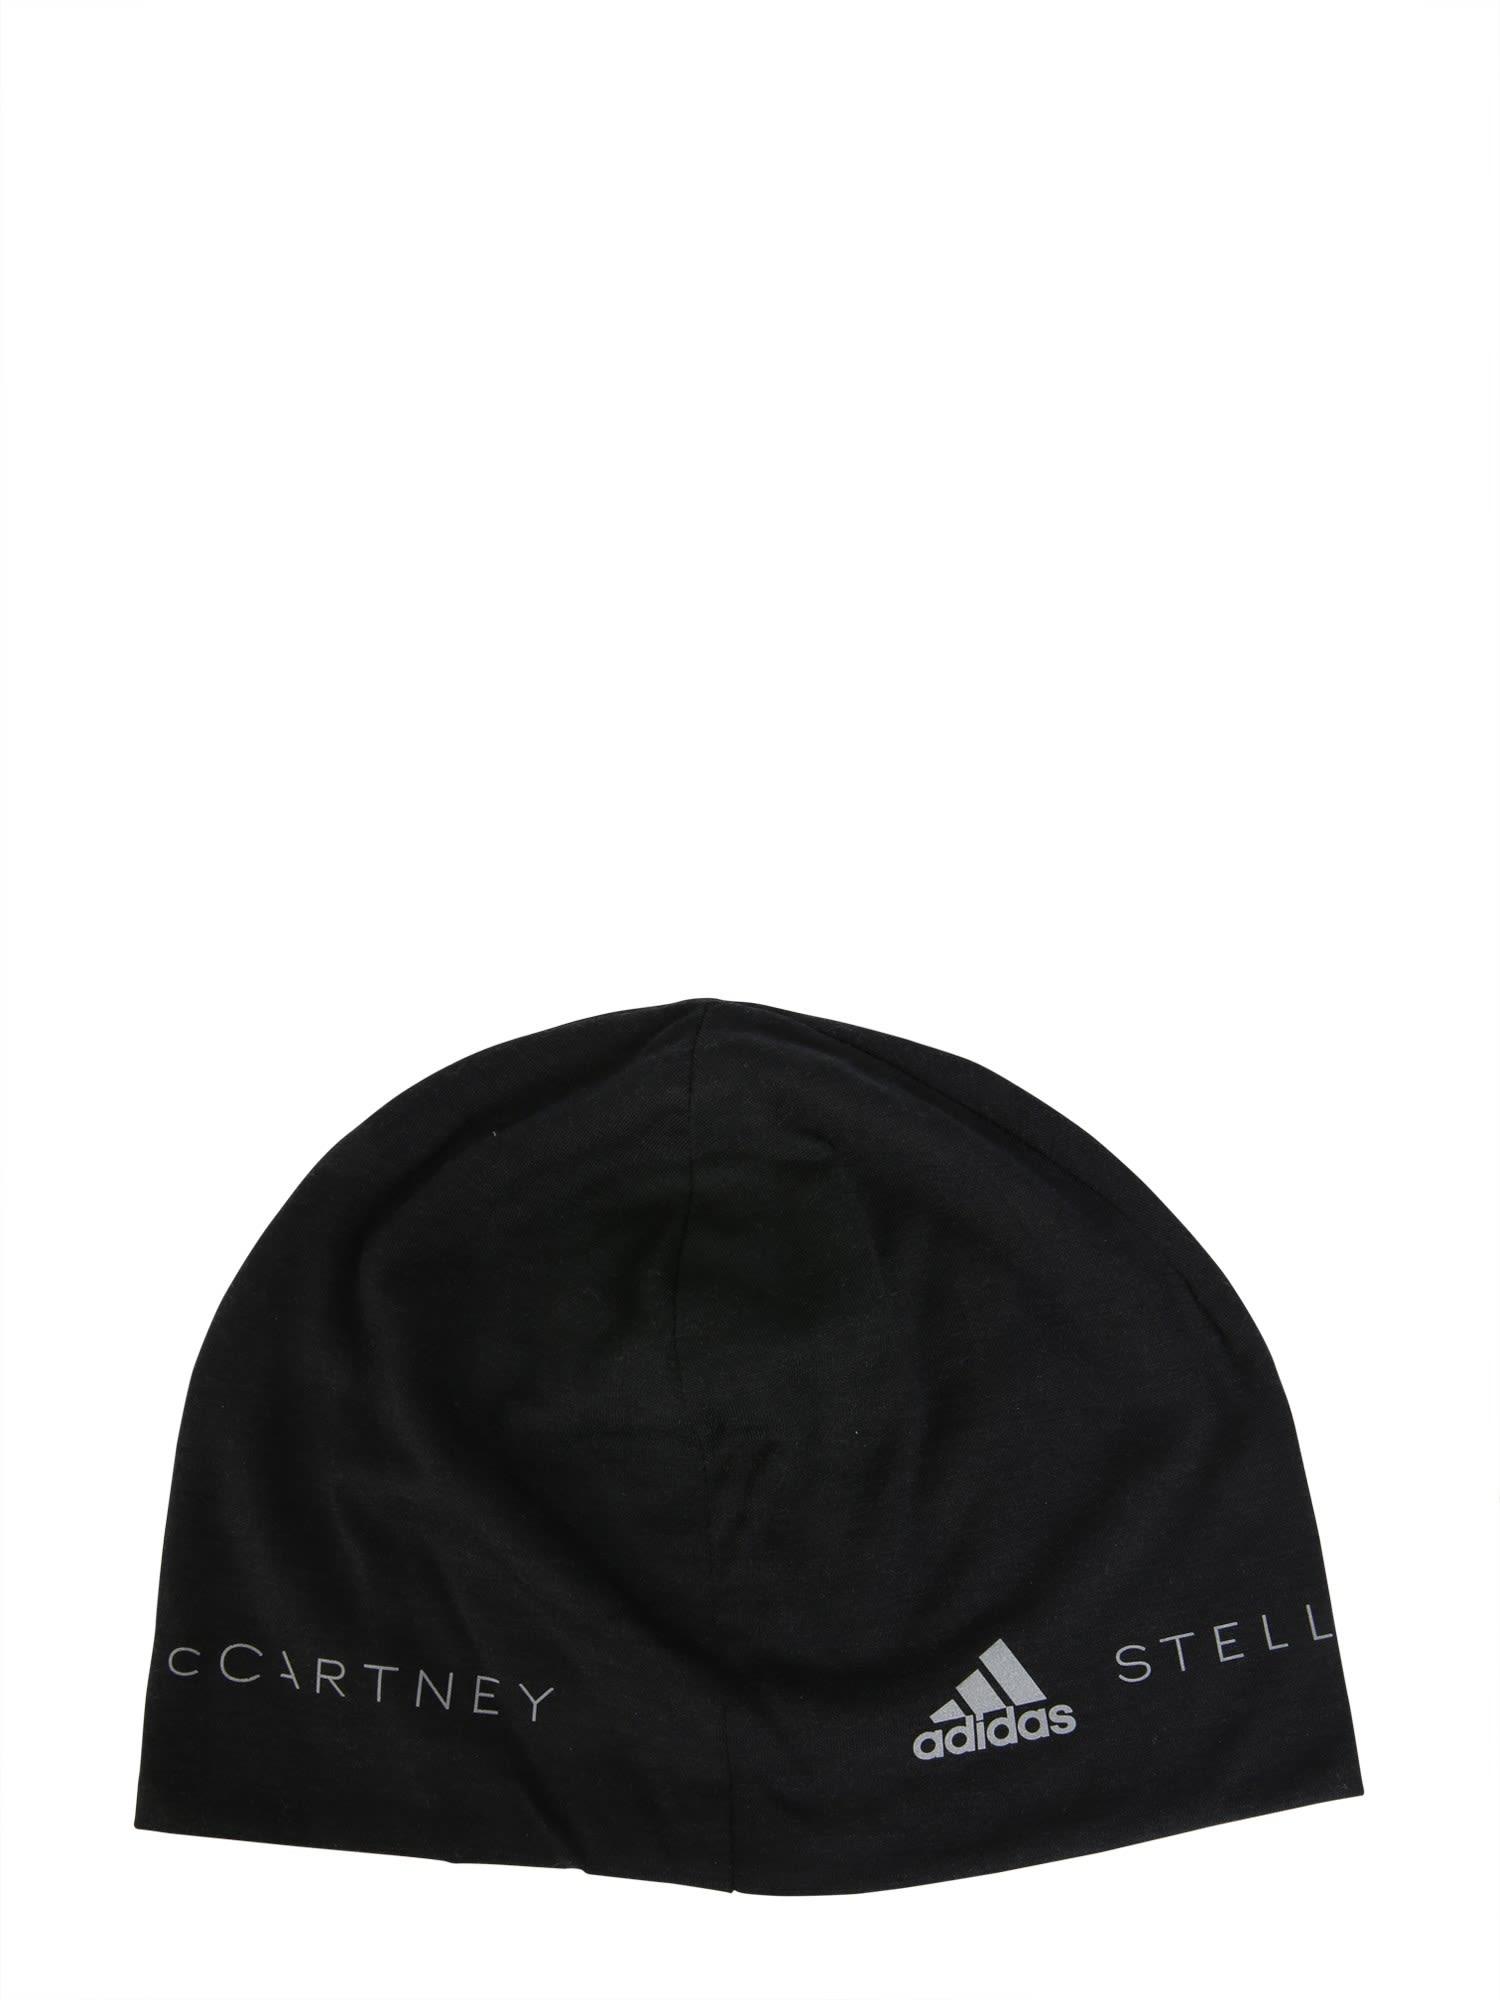 Adidas by Stella McCartney Beanie With Logo